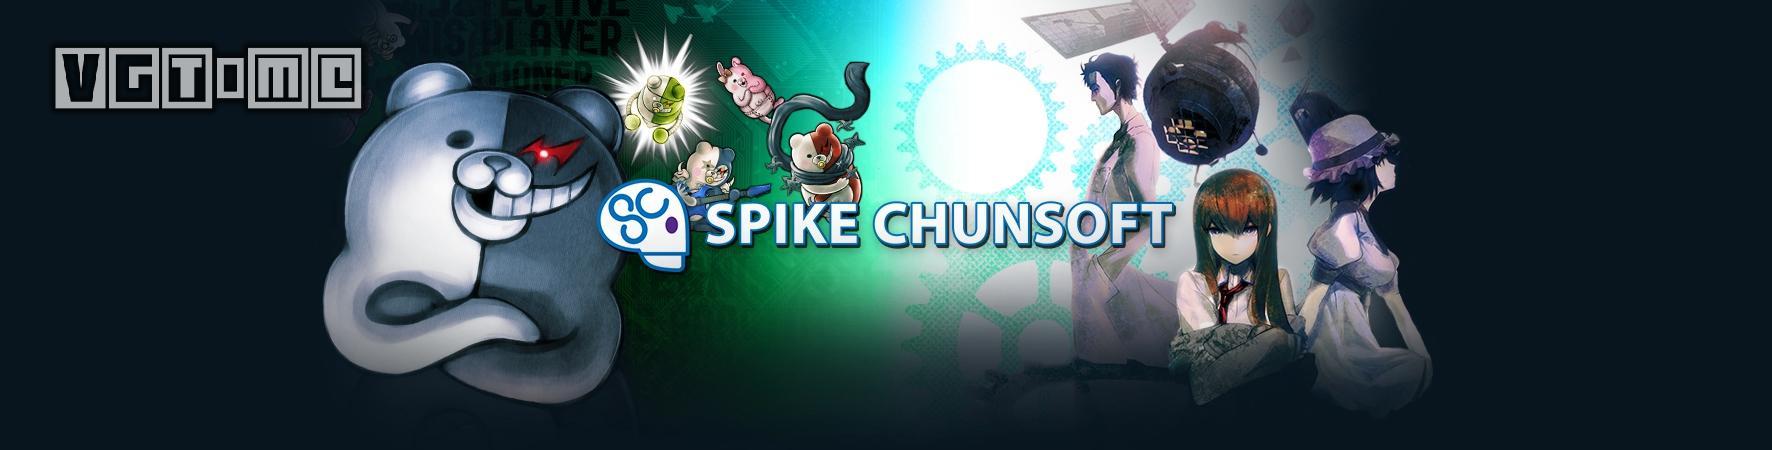 Spike Chunsoft开启Steambetway官网手机版打折活动,《弹丸论破》三部曲只要80块